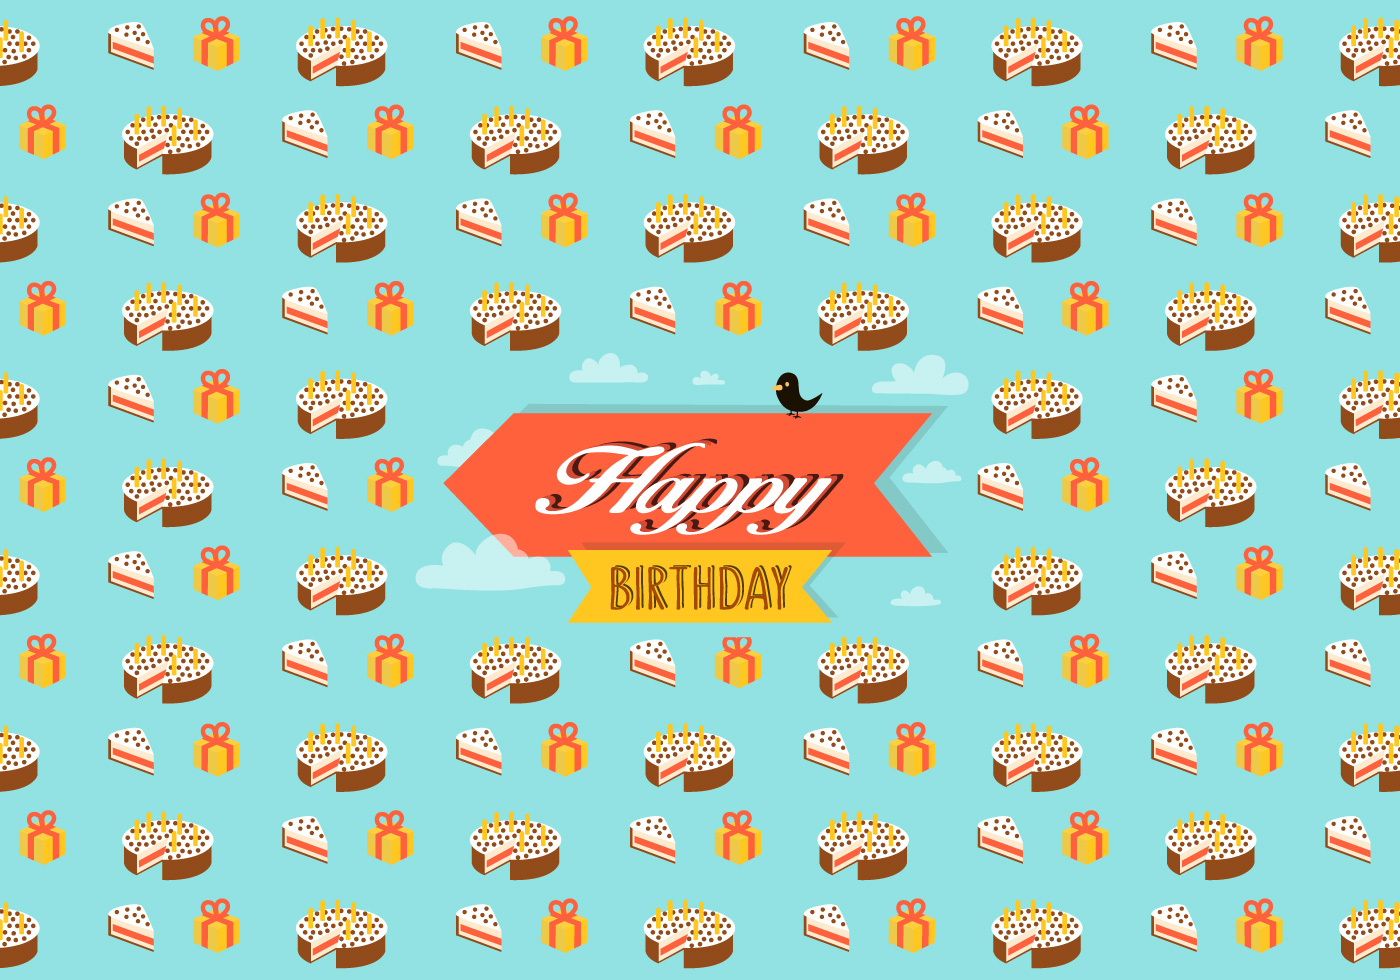 Birthday pattern background - Download Free Vector Art ...